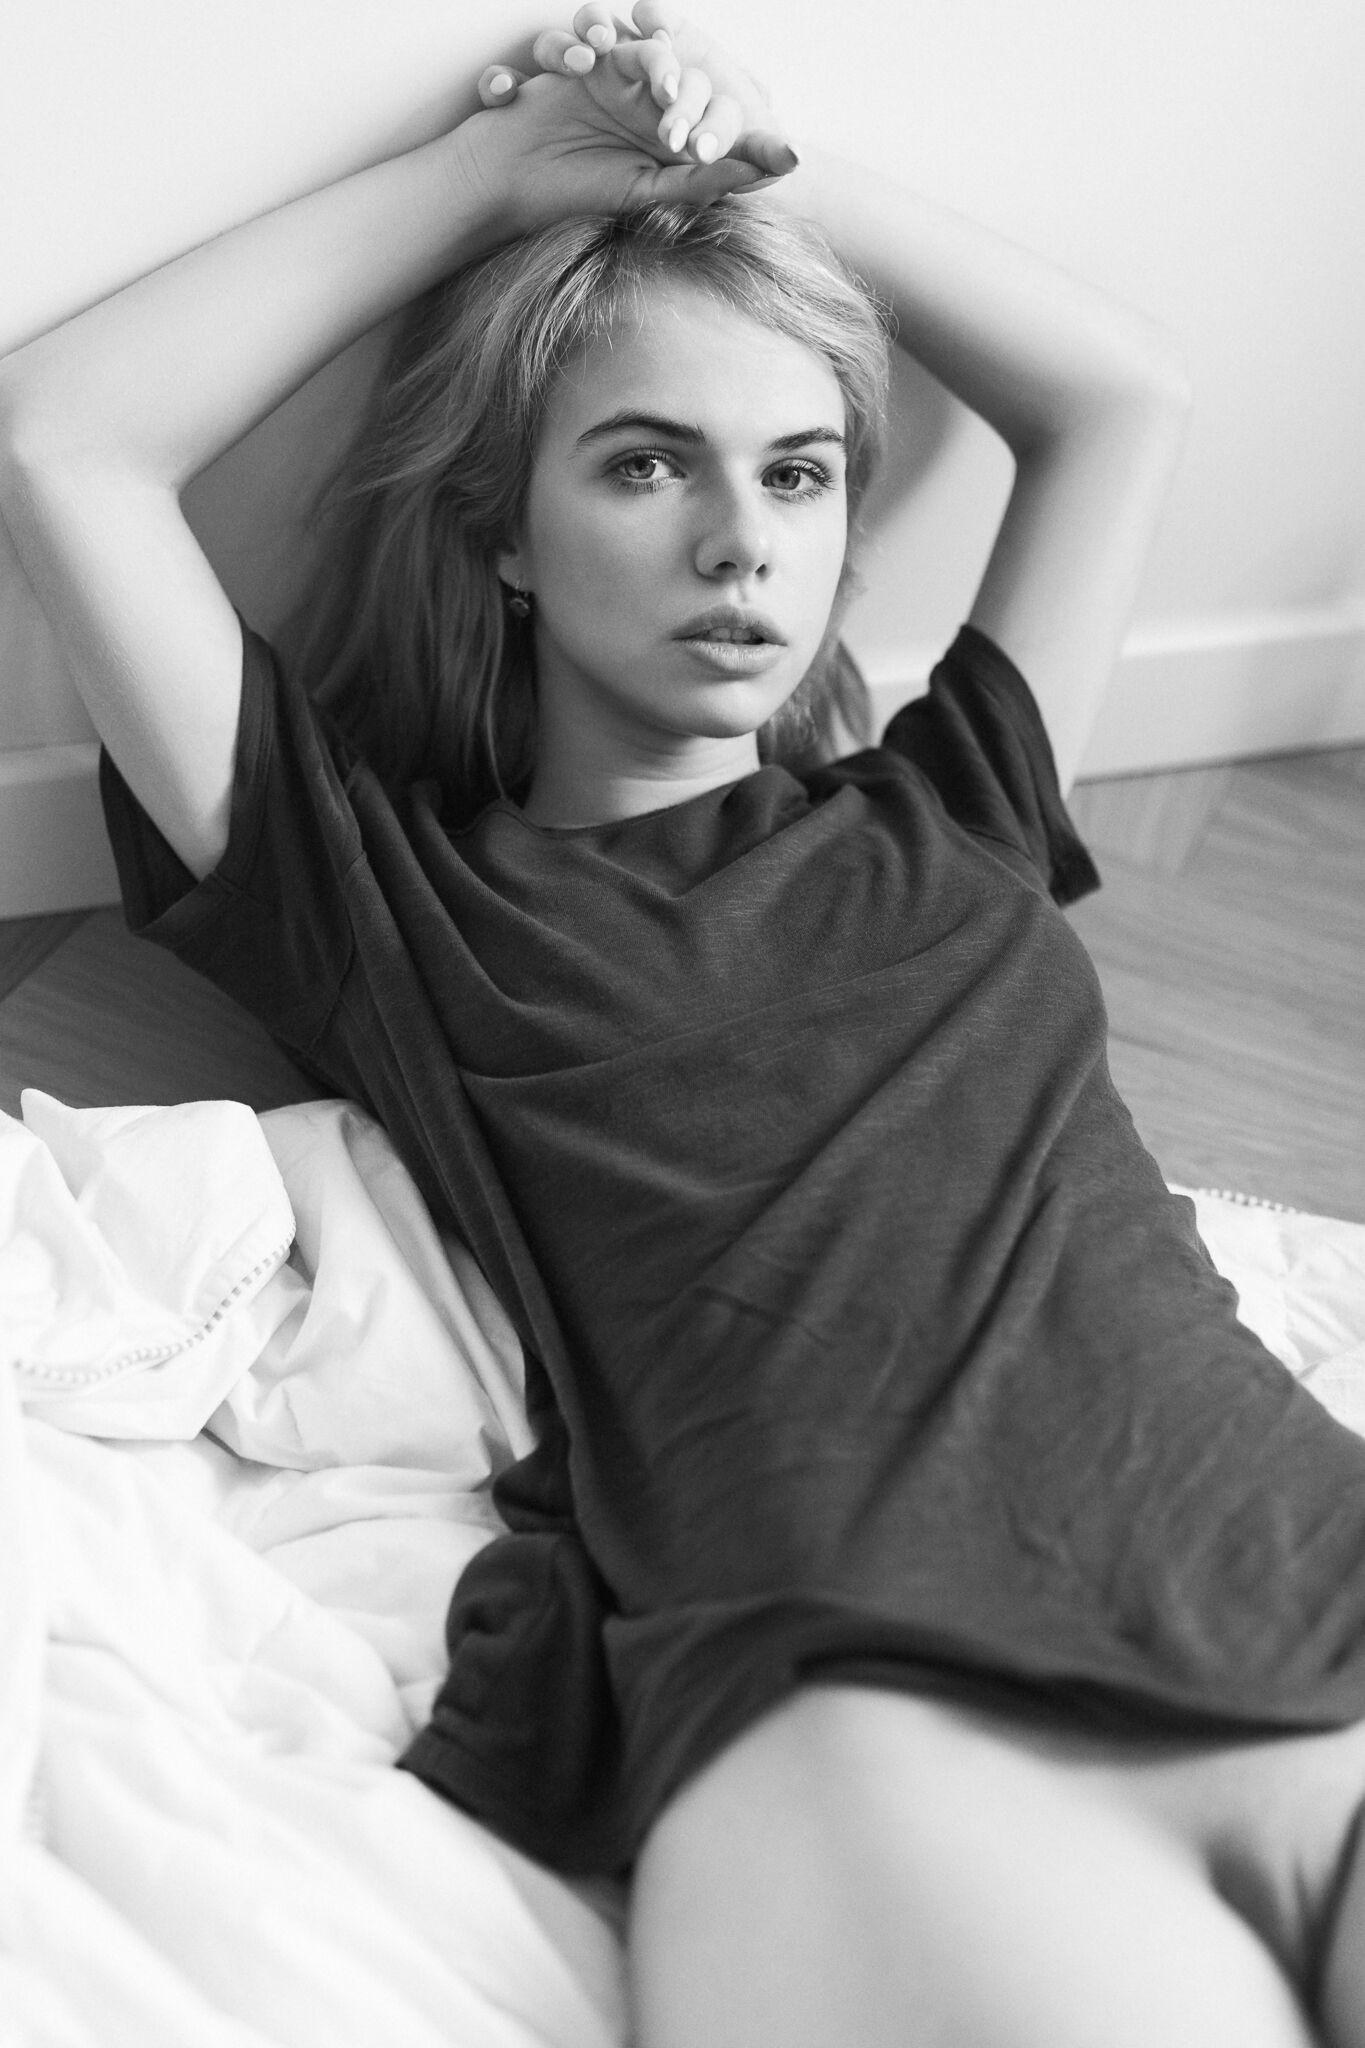 Alexandra Smelova by The Photton